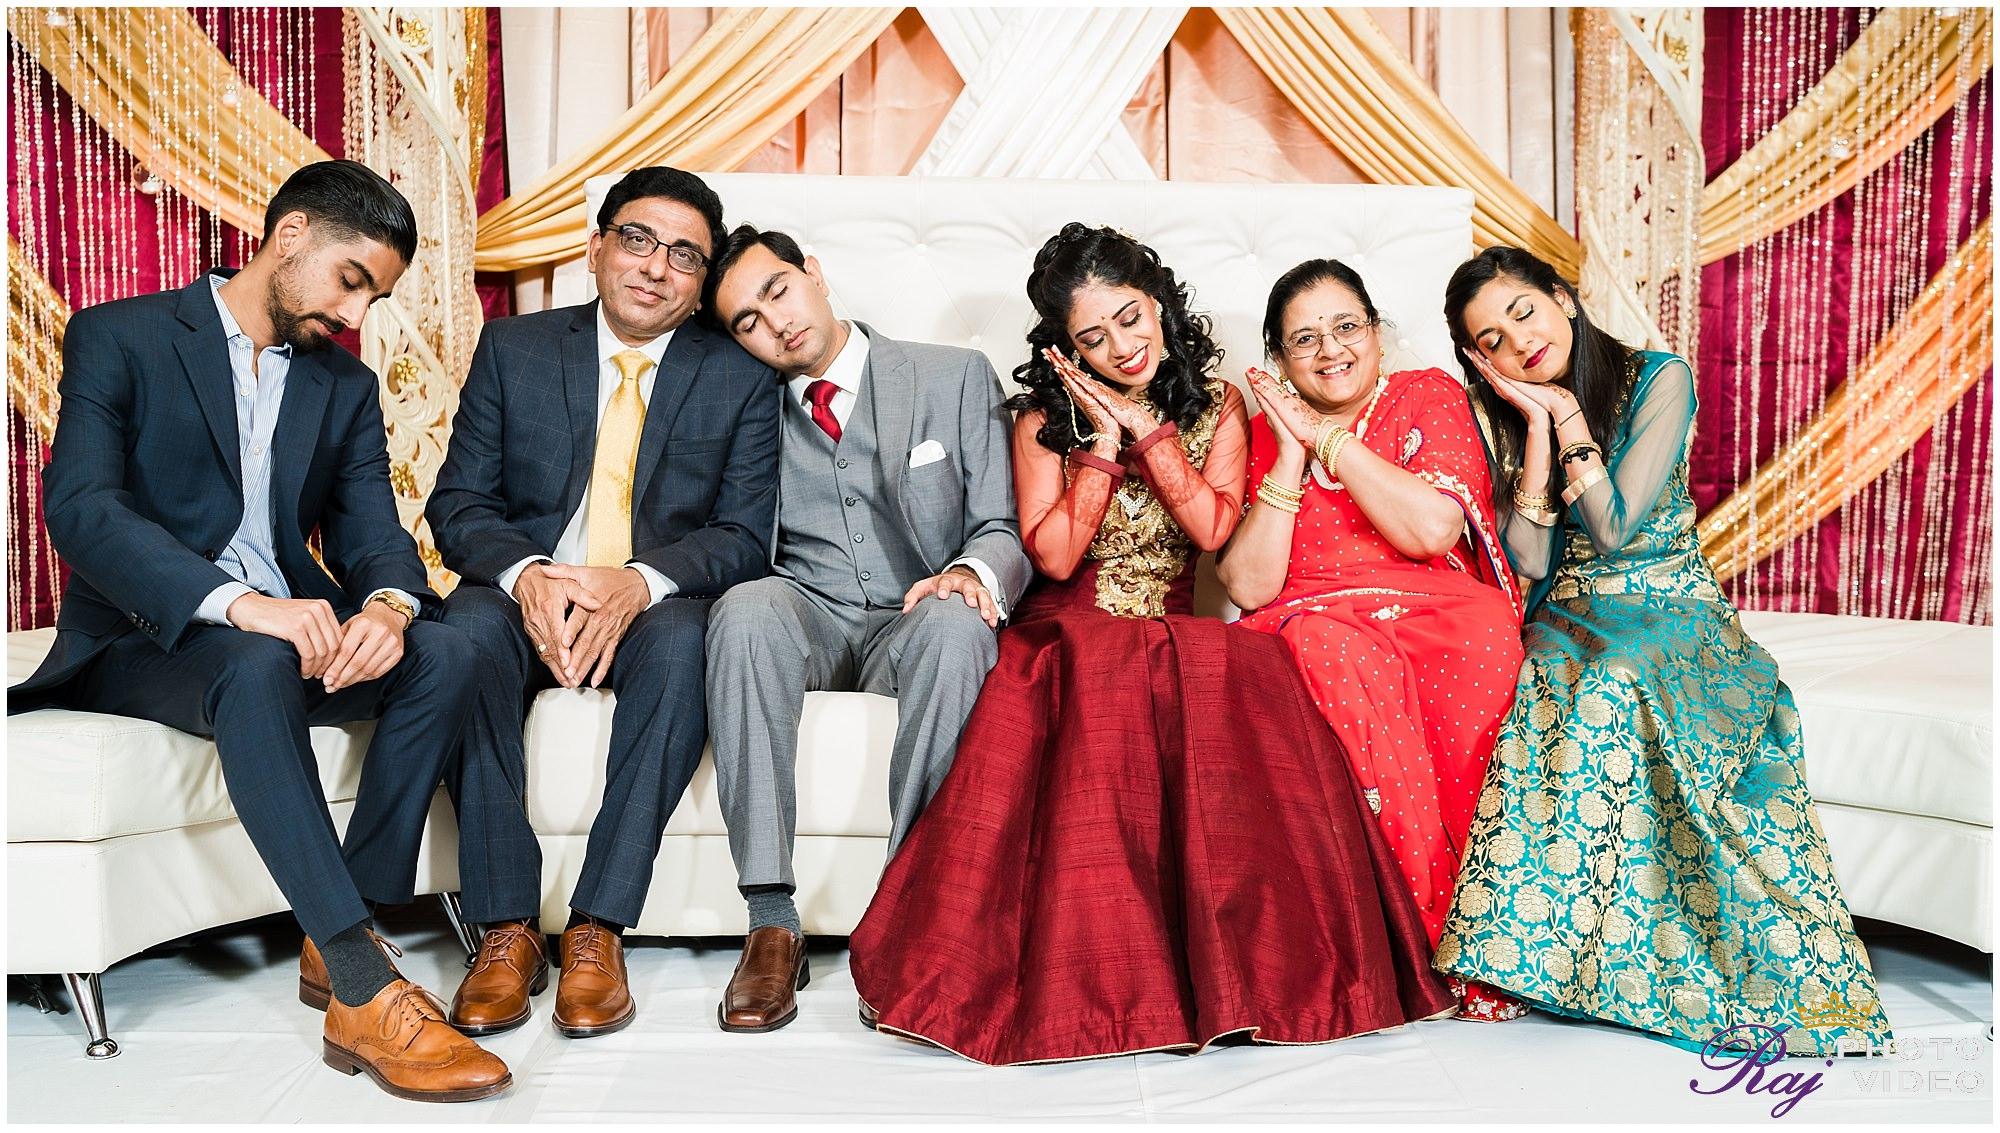 Founders-Inn-and-Spa-Virginia-Beach-VA-Indian-Wedding-Harini-Vivek-93.jpg